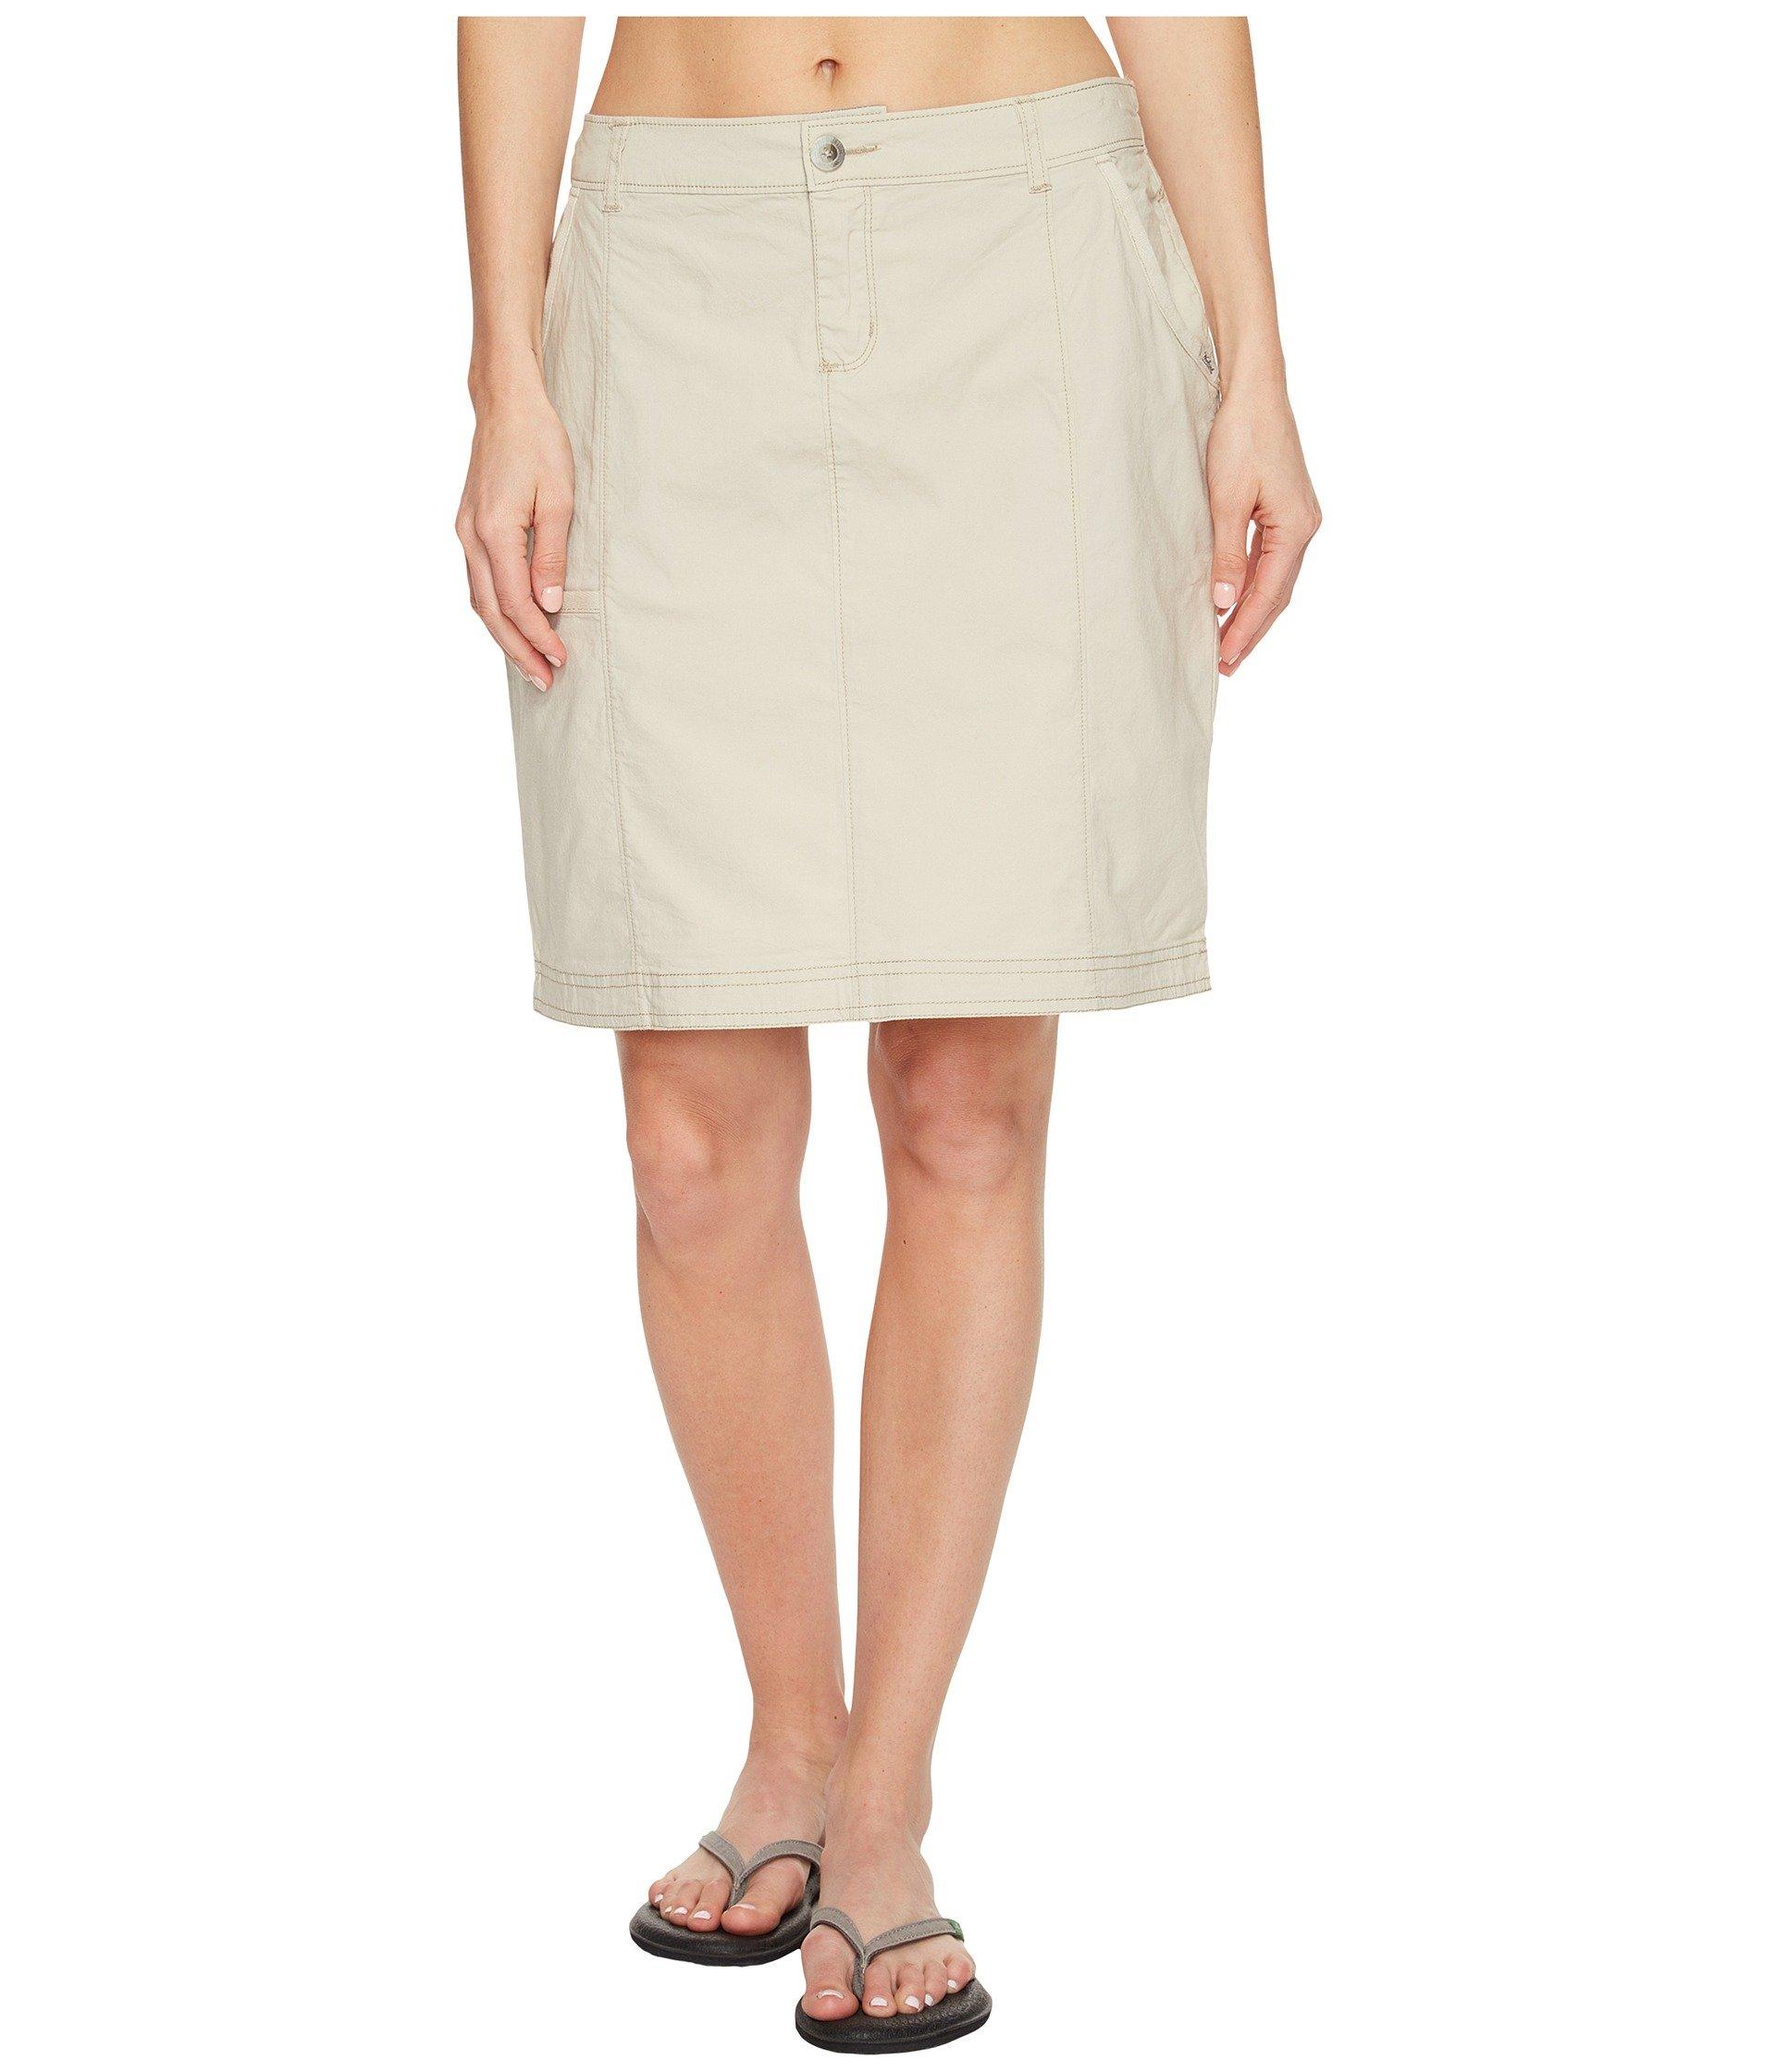 Falda para Mujer Woolrich Vista Point Eco Rich Skirt  + Woolrich en VeoyCompro.net